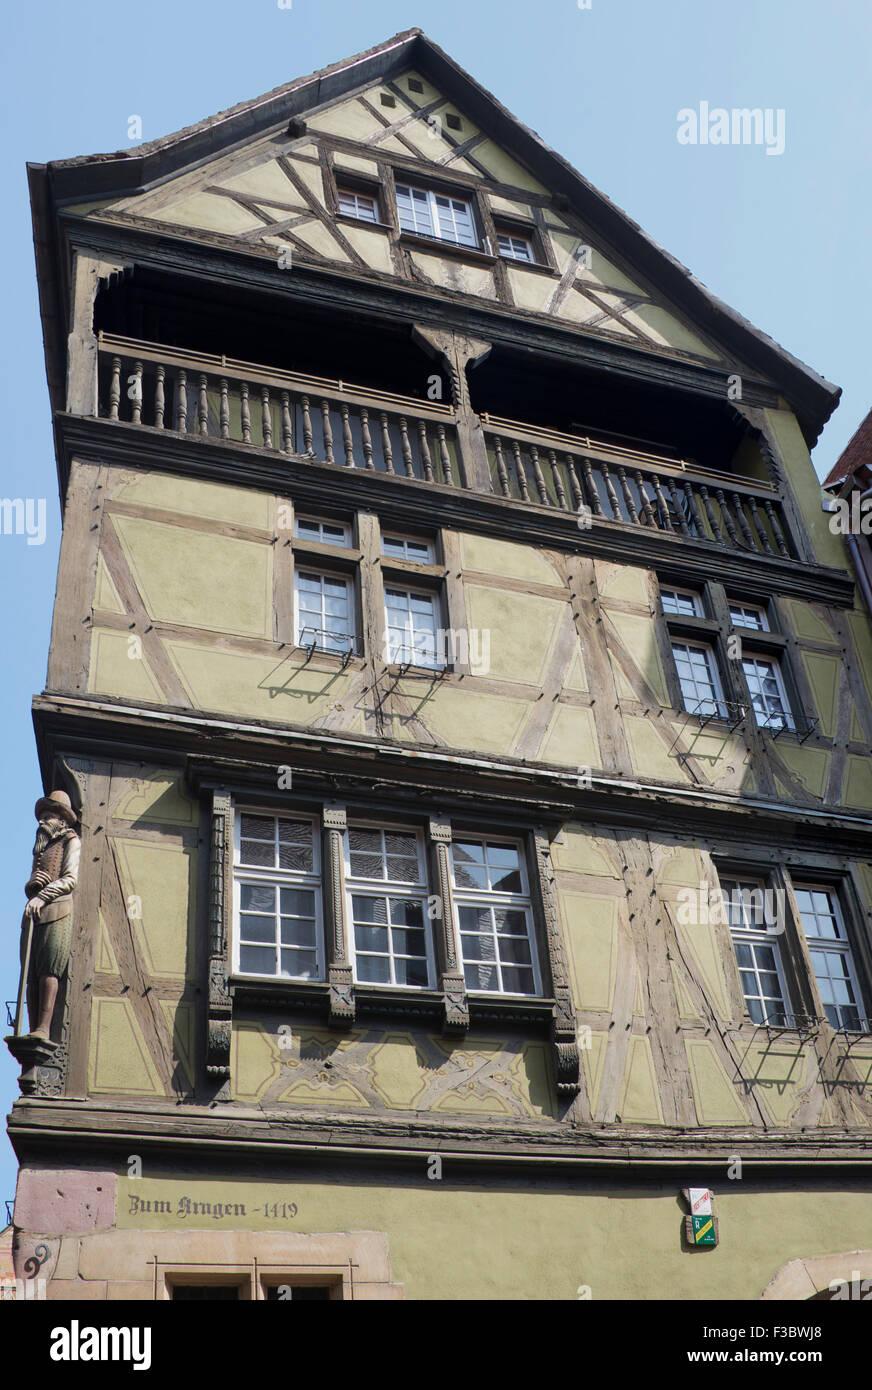 16th Century French Home - 16th-century-kragen-zum-house-colmar-alsace-france-F3BWJ8_Best 16th Century French Home - 16th-century-kragen-zum-house-colmar-alsace-france-F3BWJ8  Best Photo Reference_188230.jpg